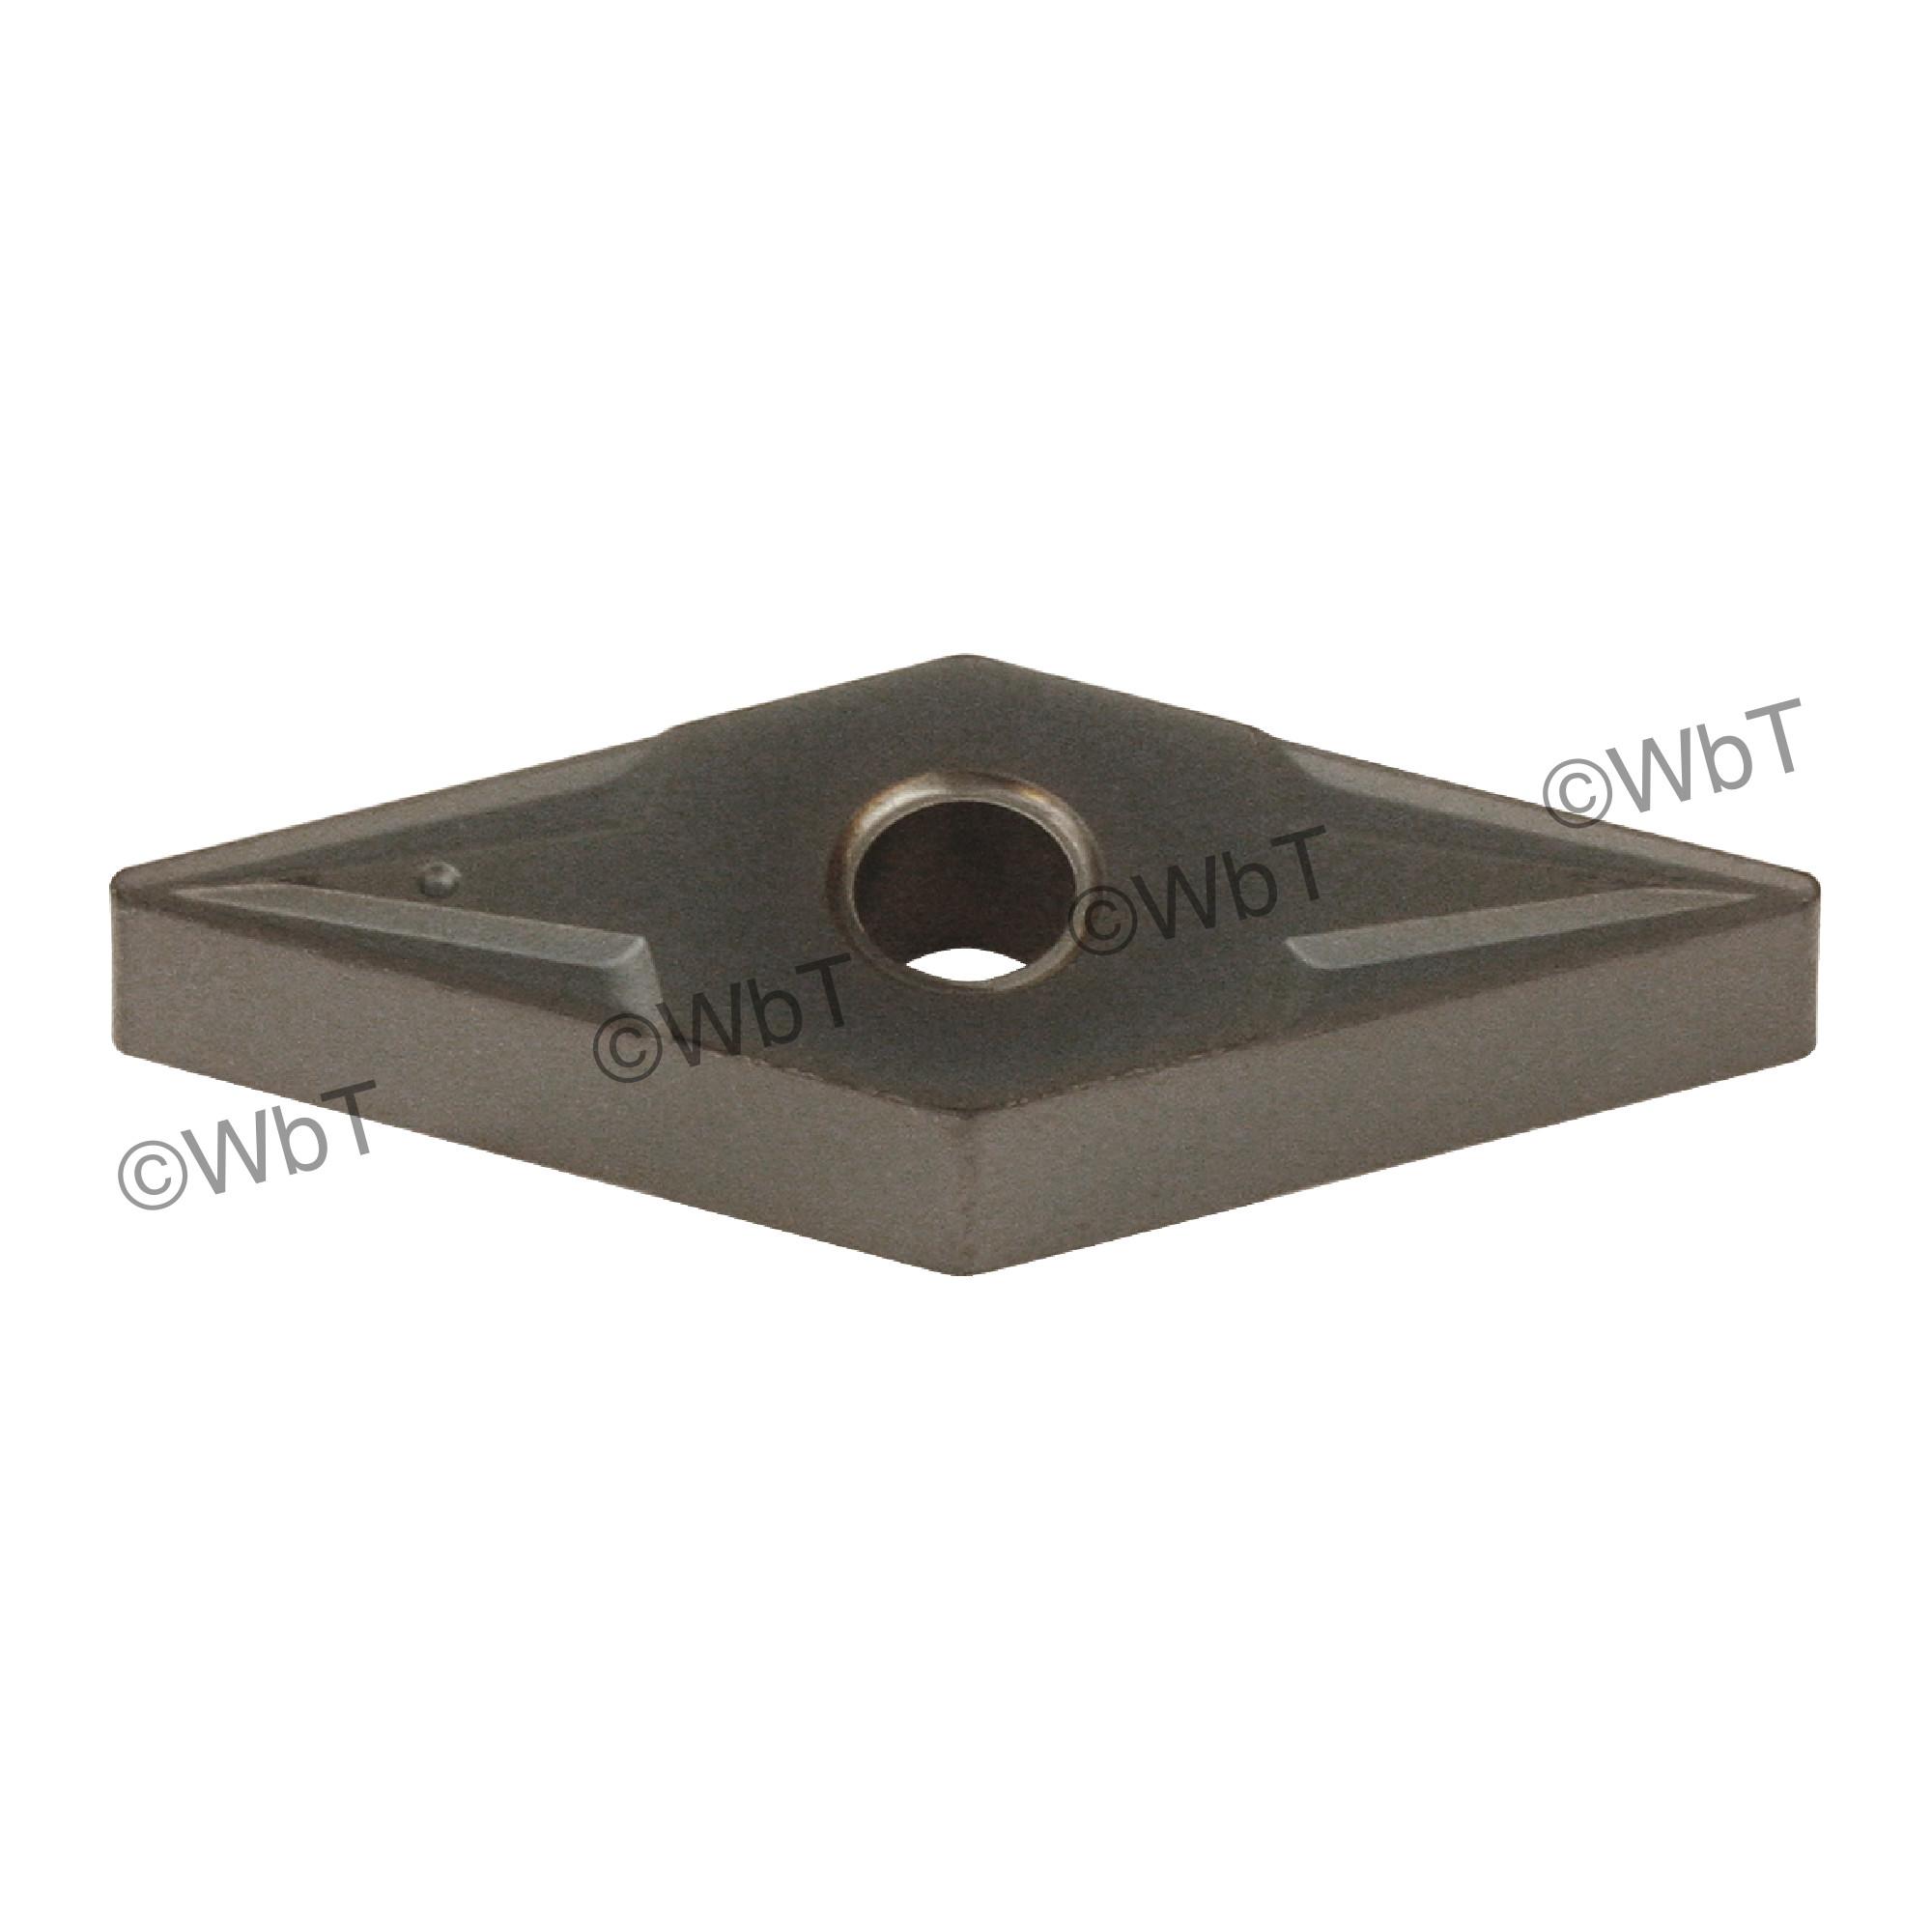 LAMINA - VNMG331-NN LT10 - 35° Diamond / Indexable Carbide Turning Insert